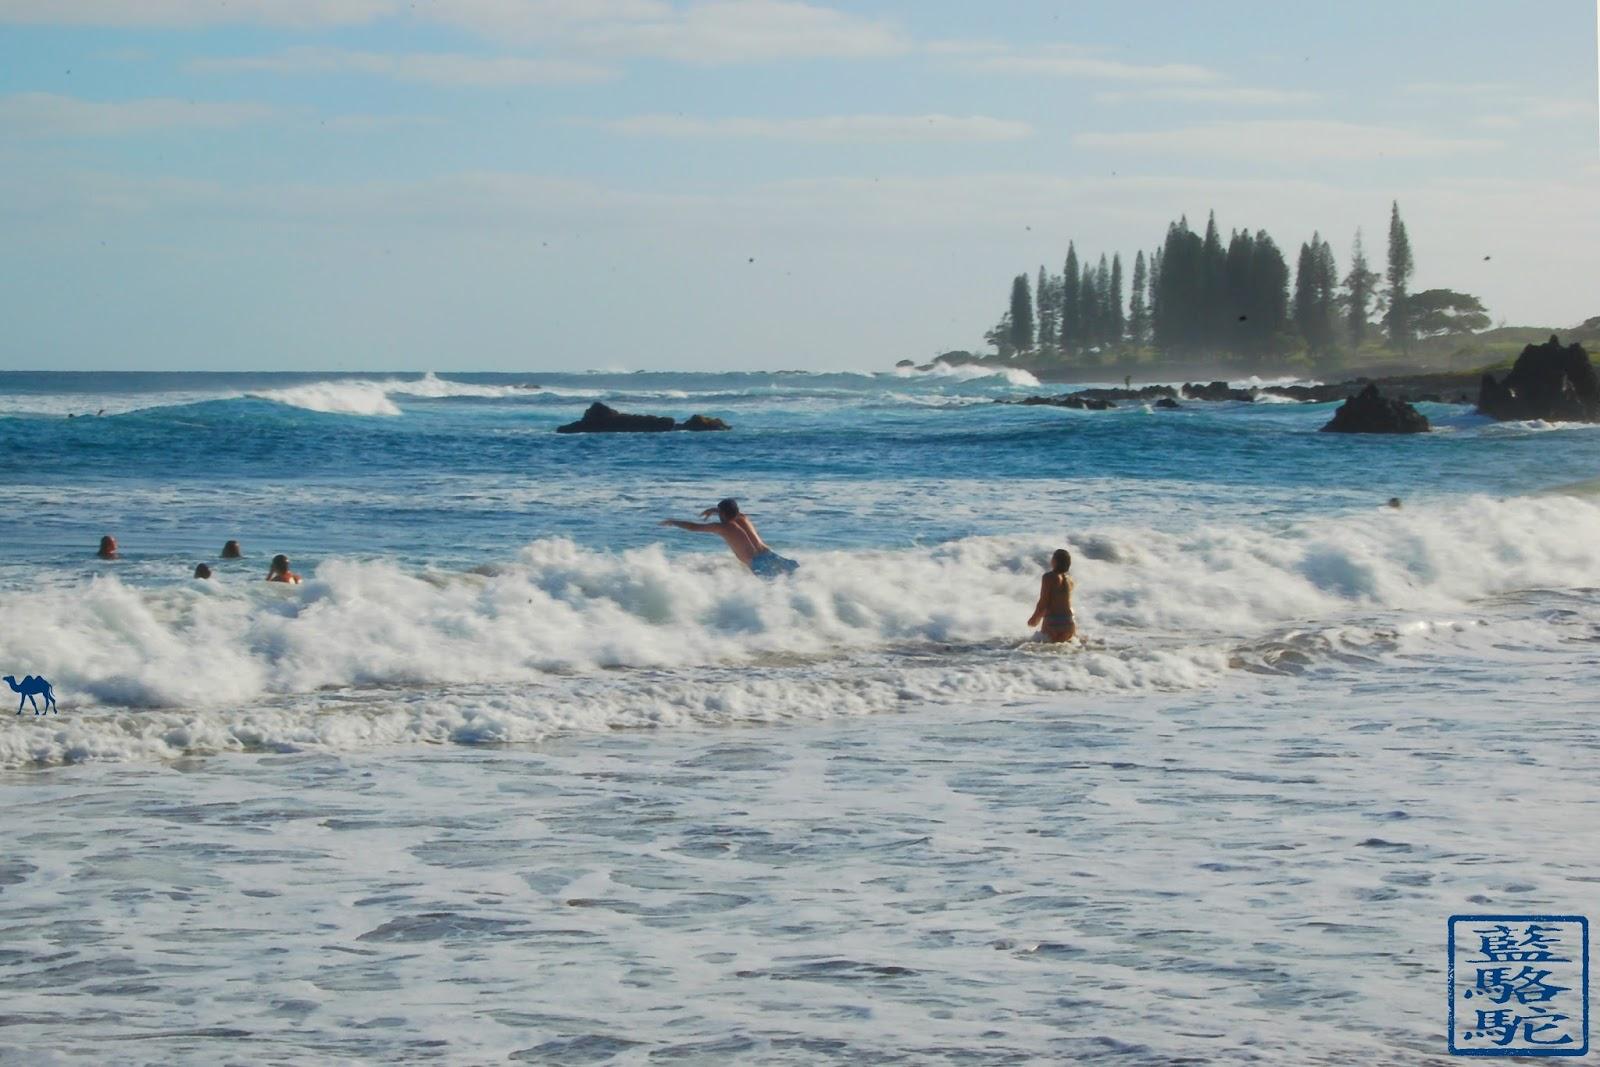 Le Chameau Bleu - Blog Voyage Hawaii - Plage Maui - Vagues d'Hawaii